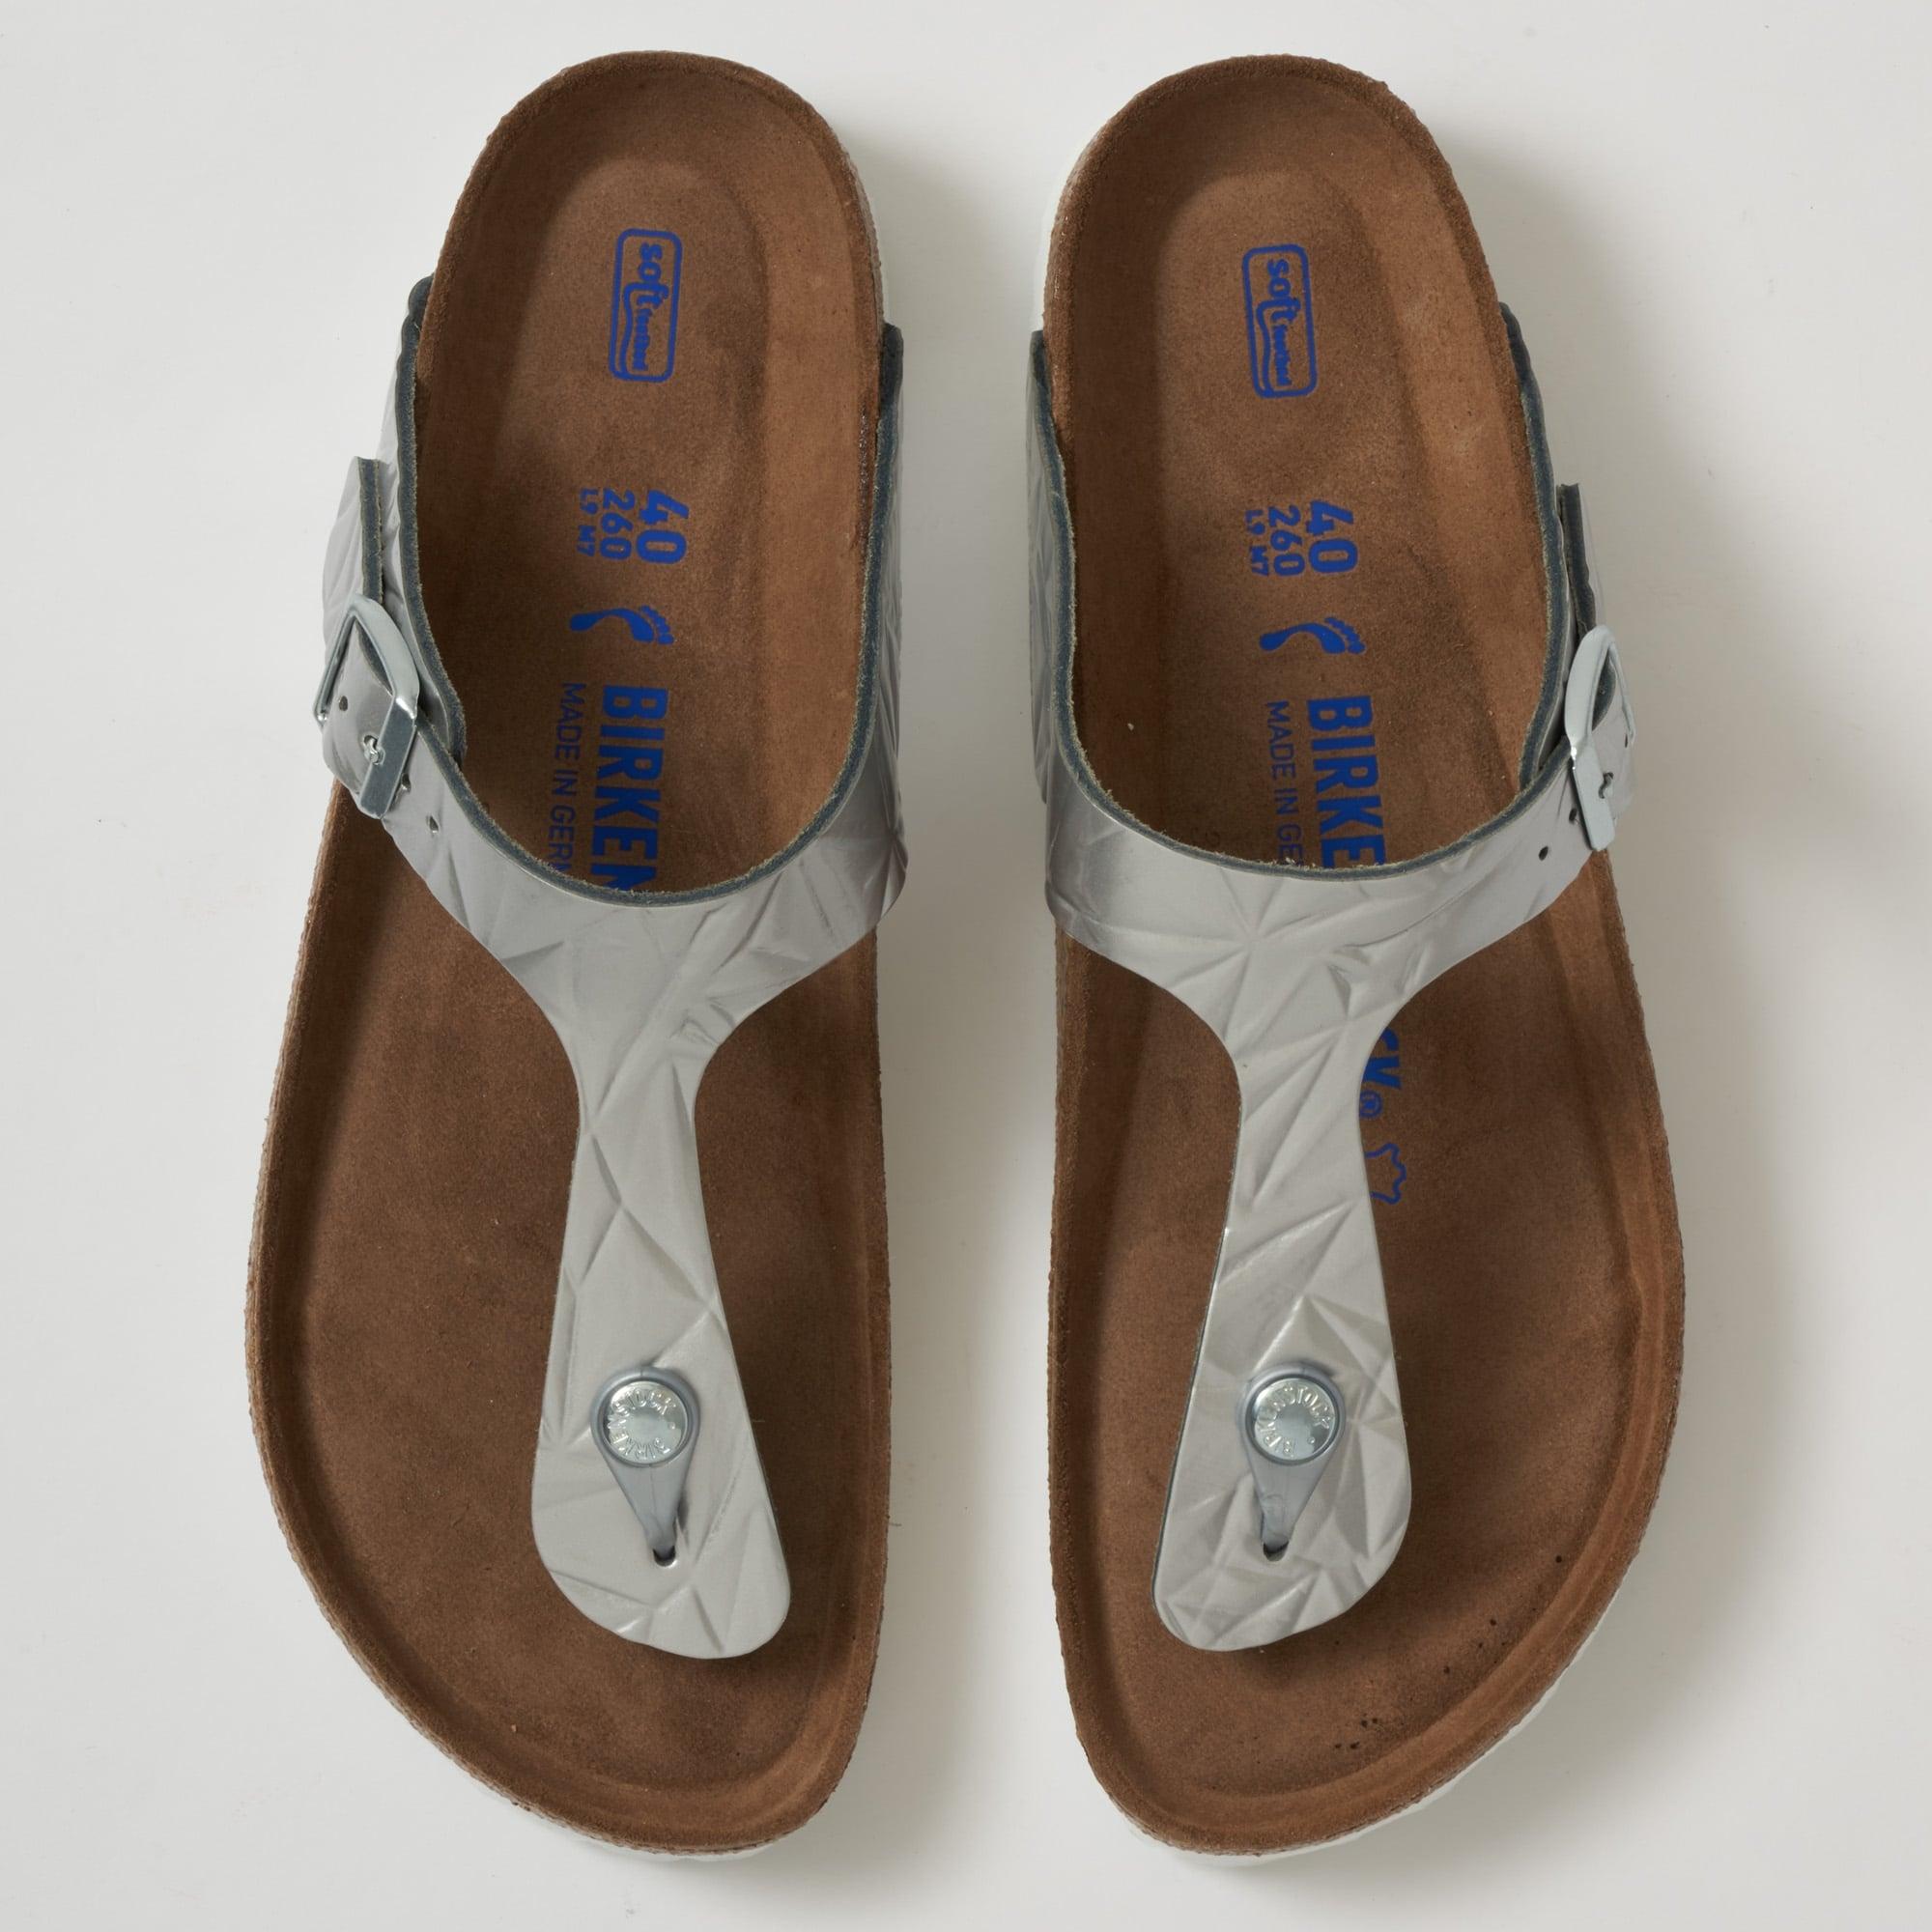 a9b921787 Birkenstock Gizeh Sandals Silver 1008464